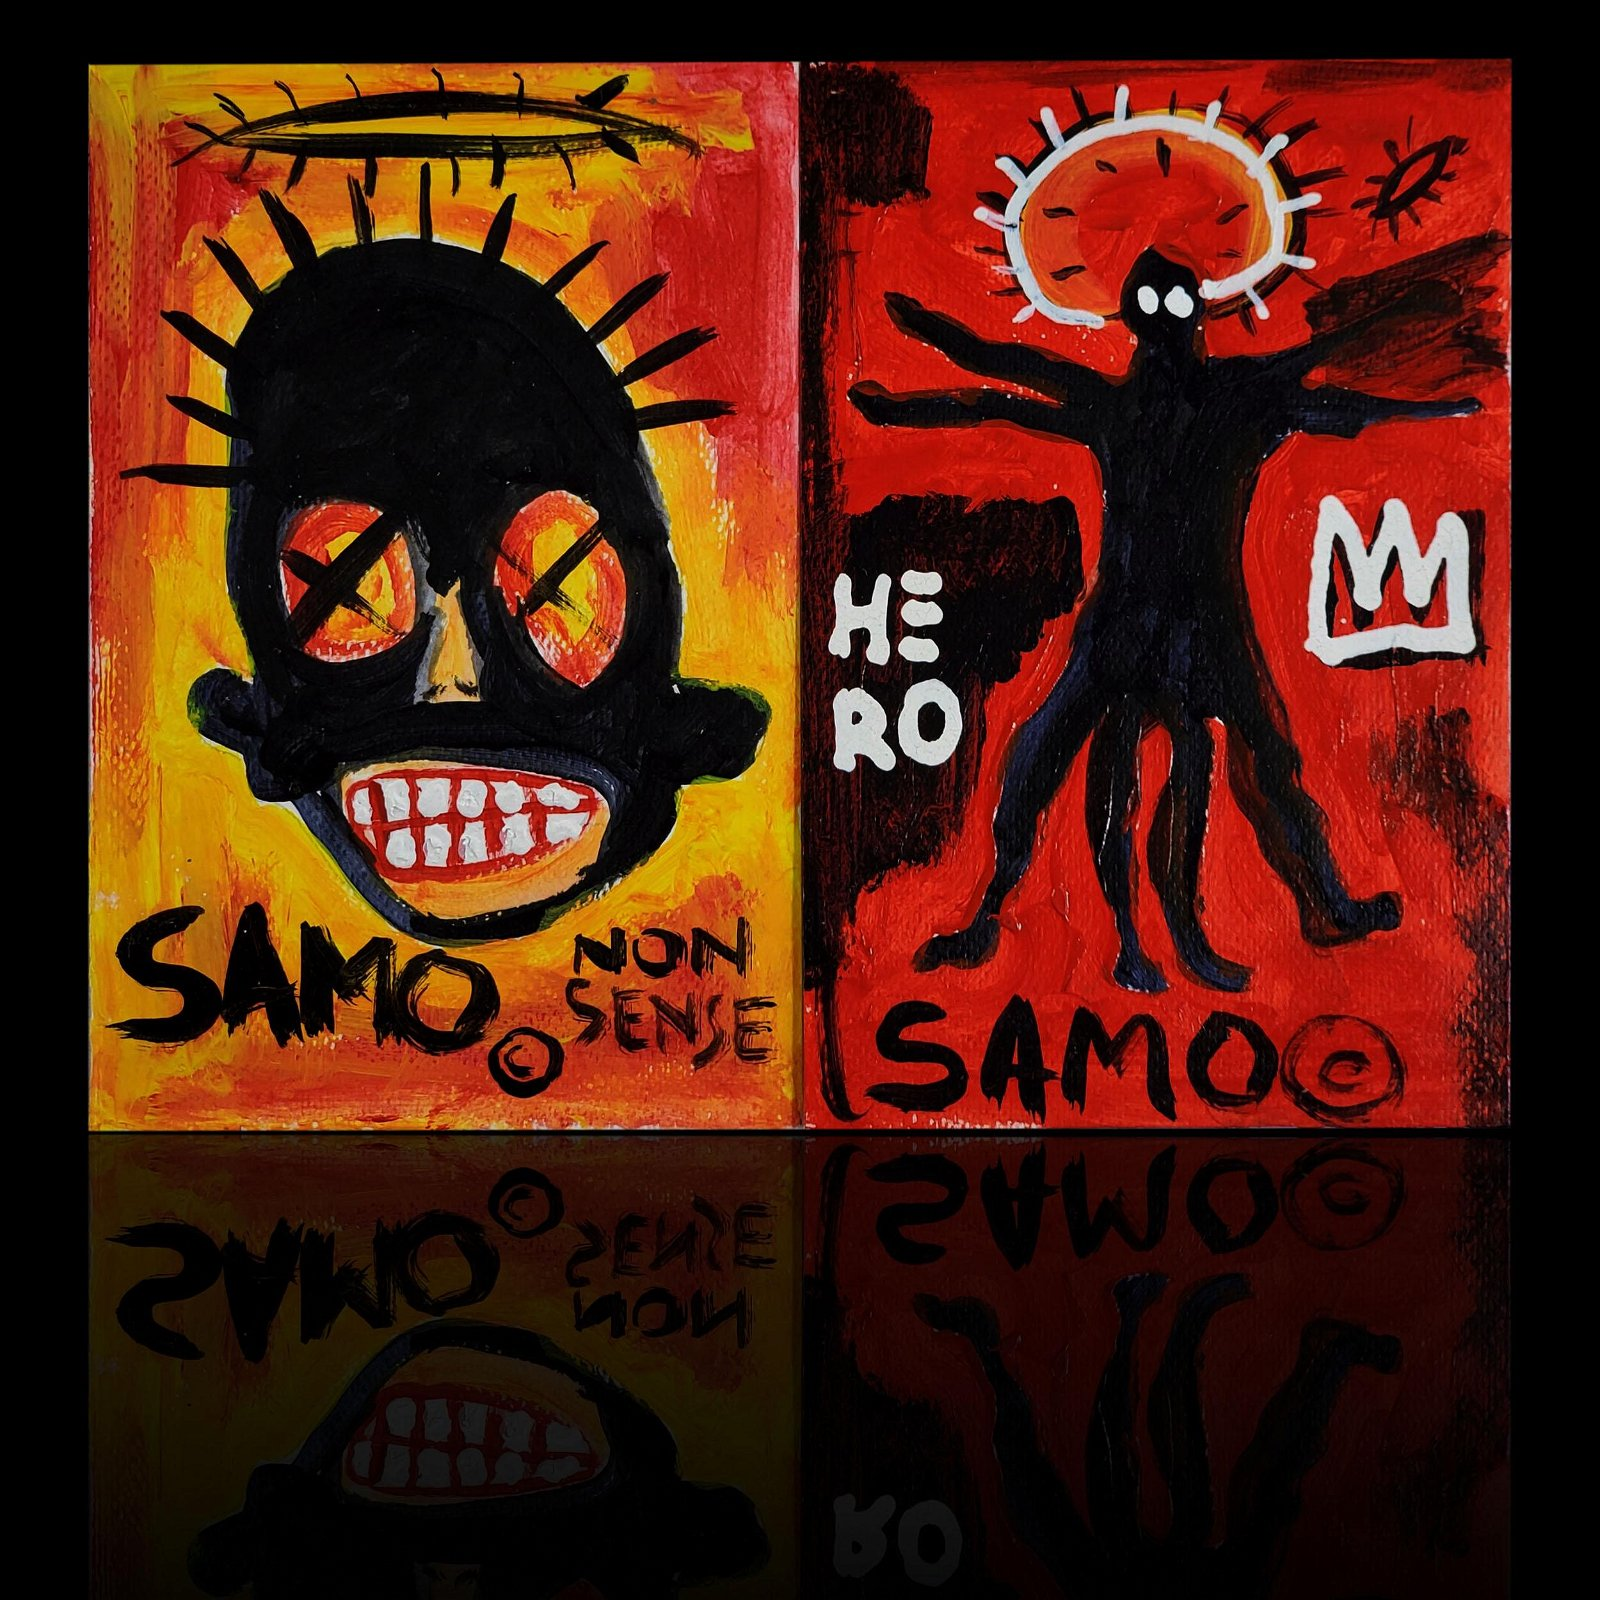 2 Jean-Michel Basquiat  1960-1988  Paintings (SAMO)**